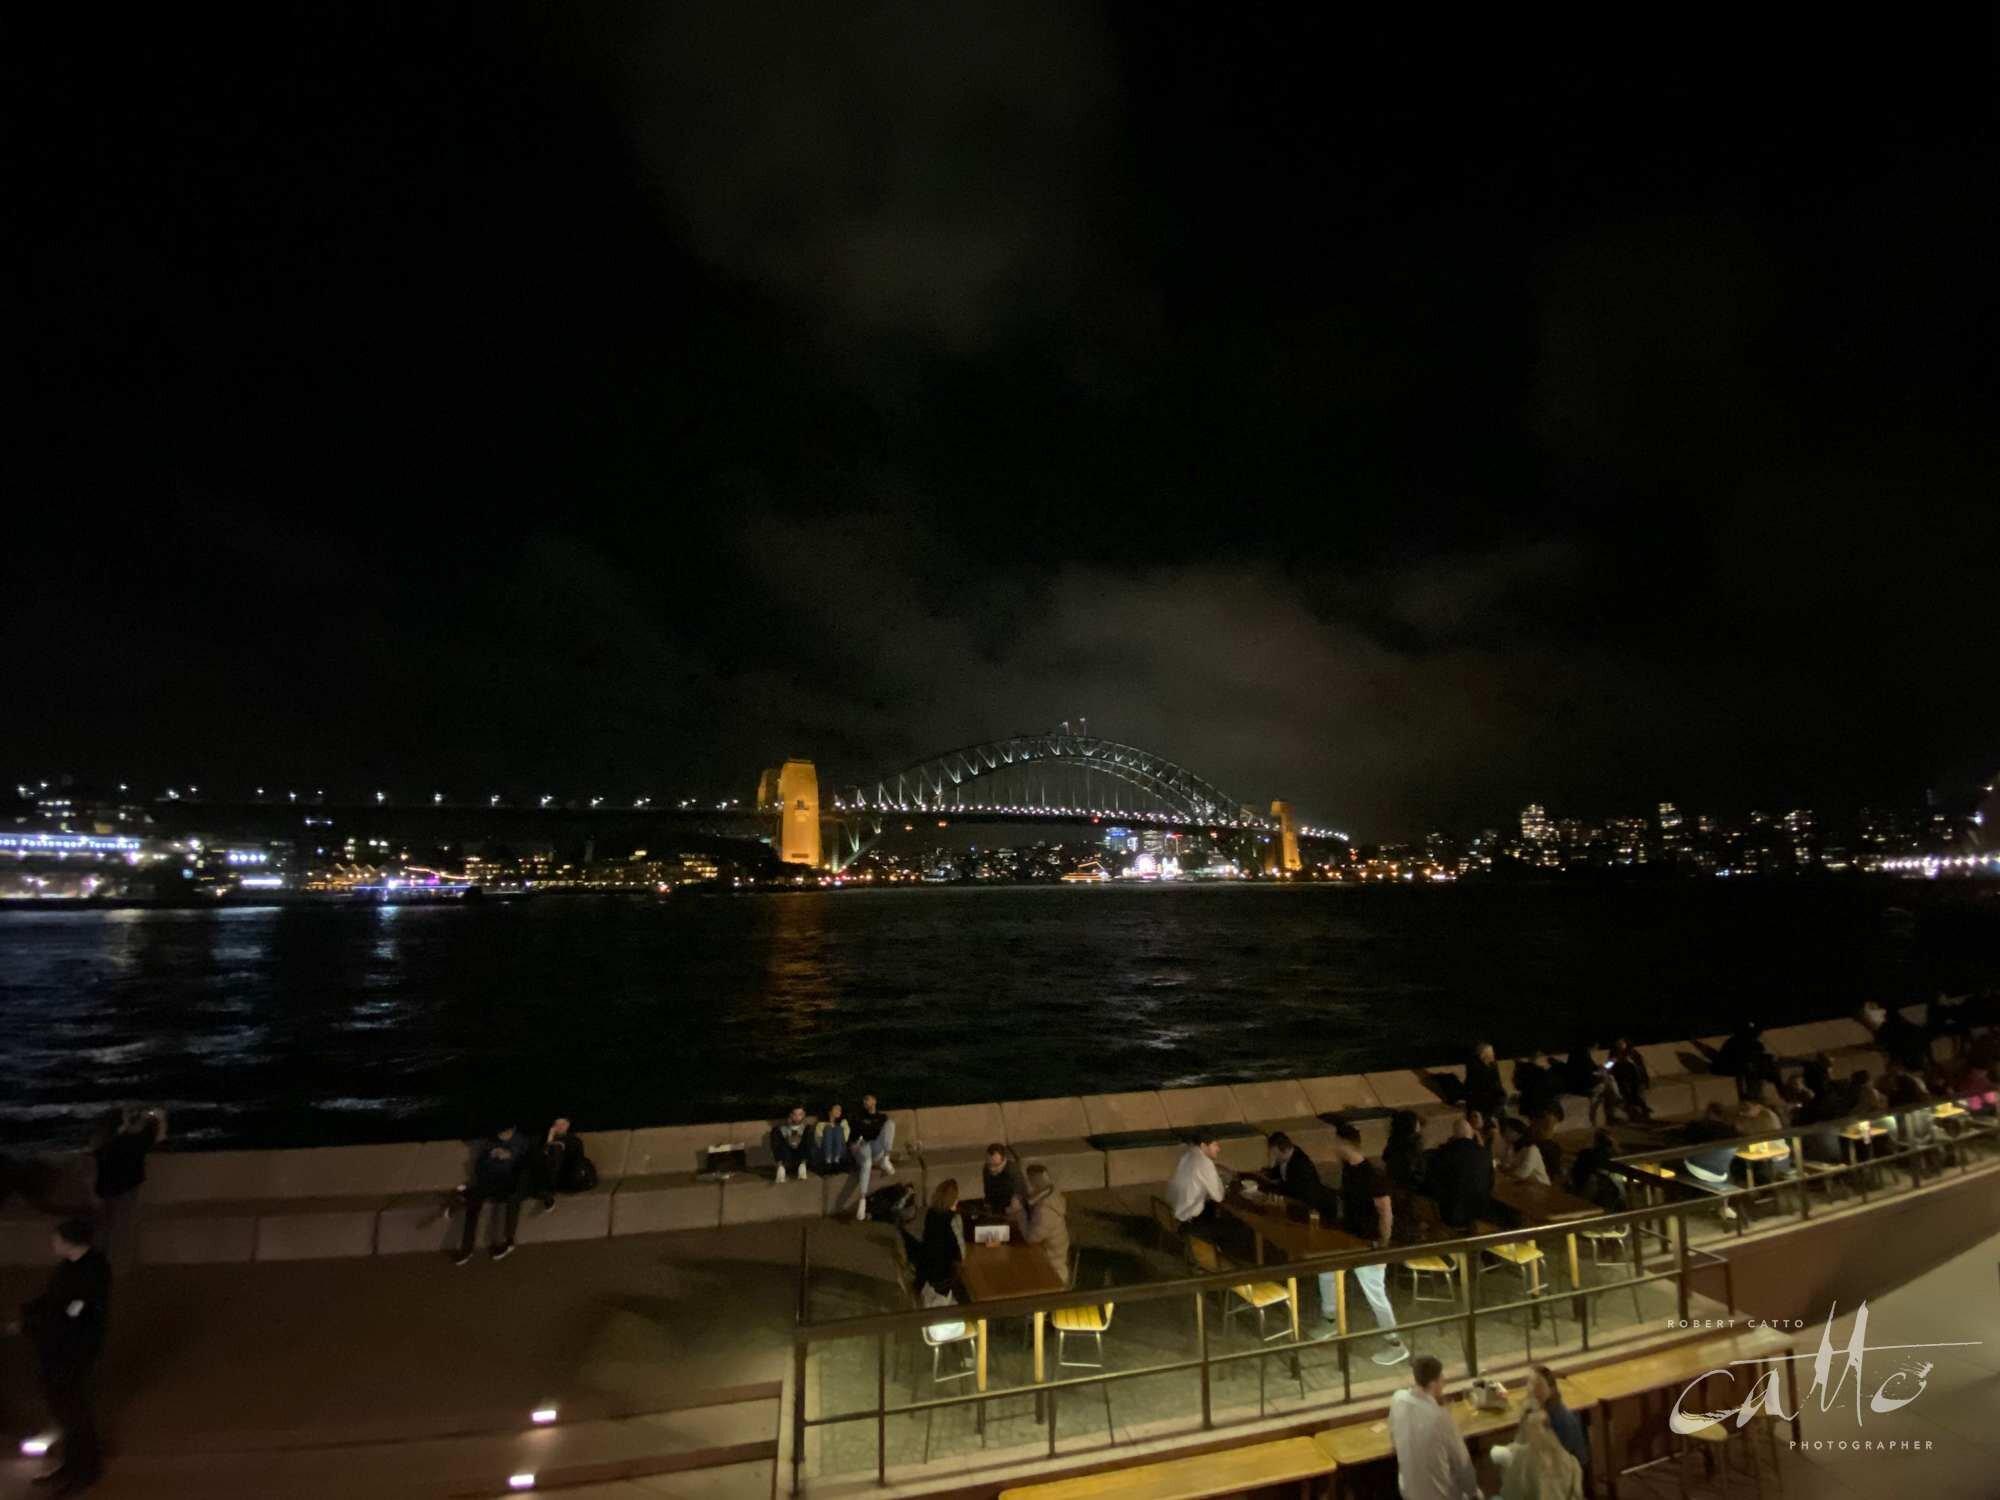 Sydney Harbour Bridge at night (0.5x wide angle lens)